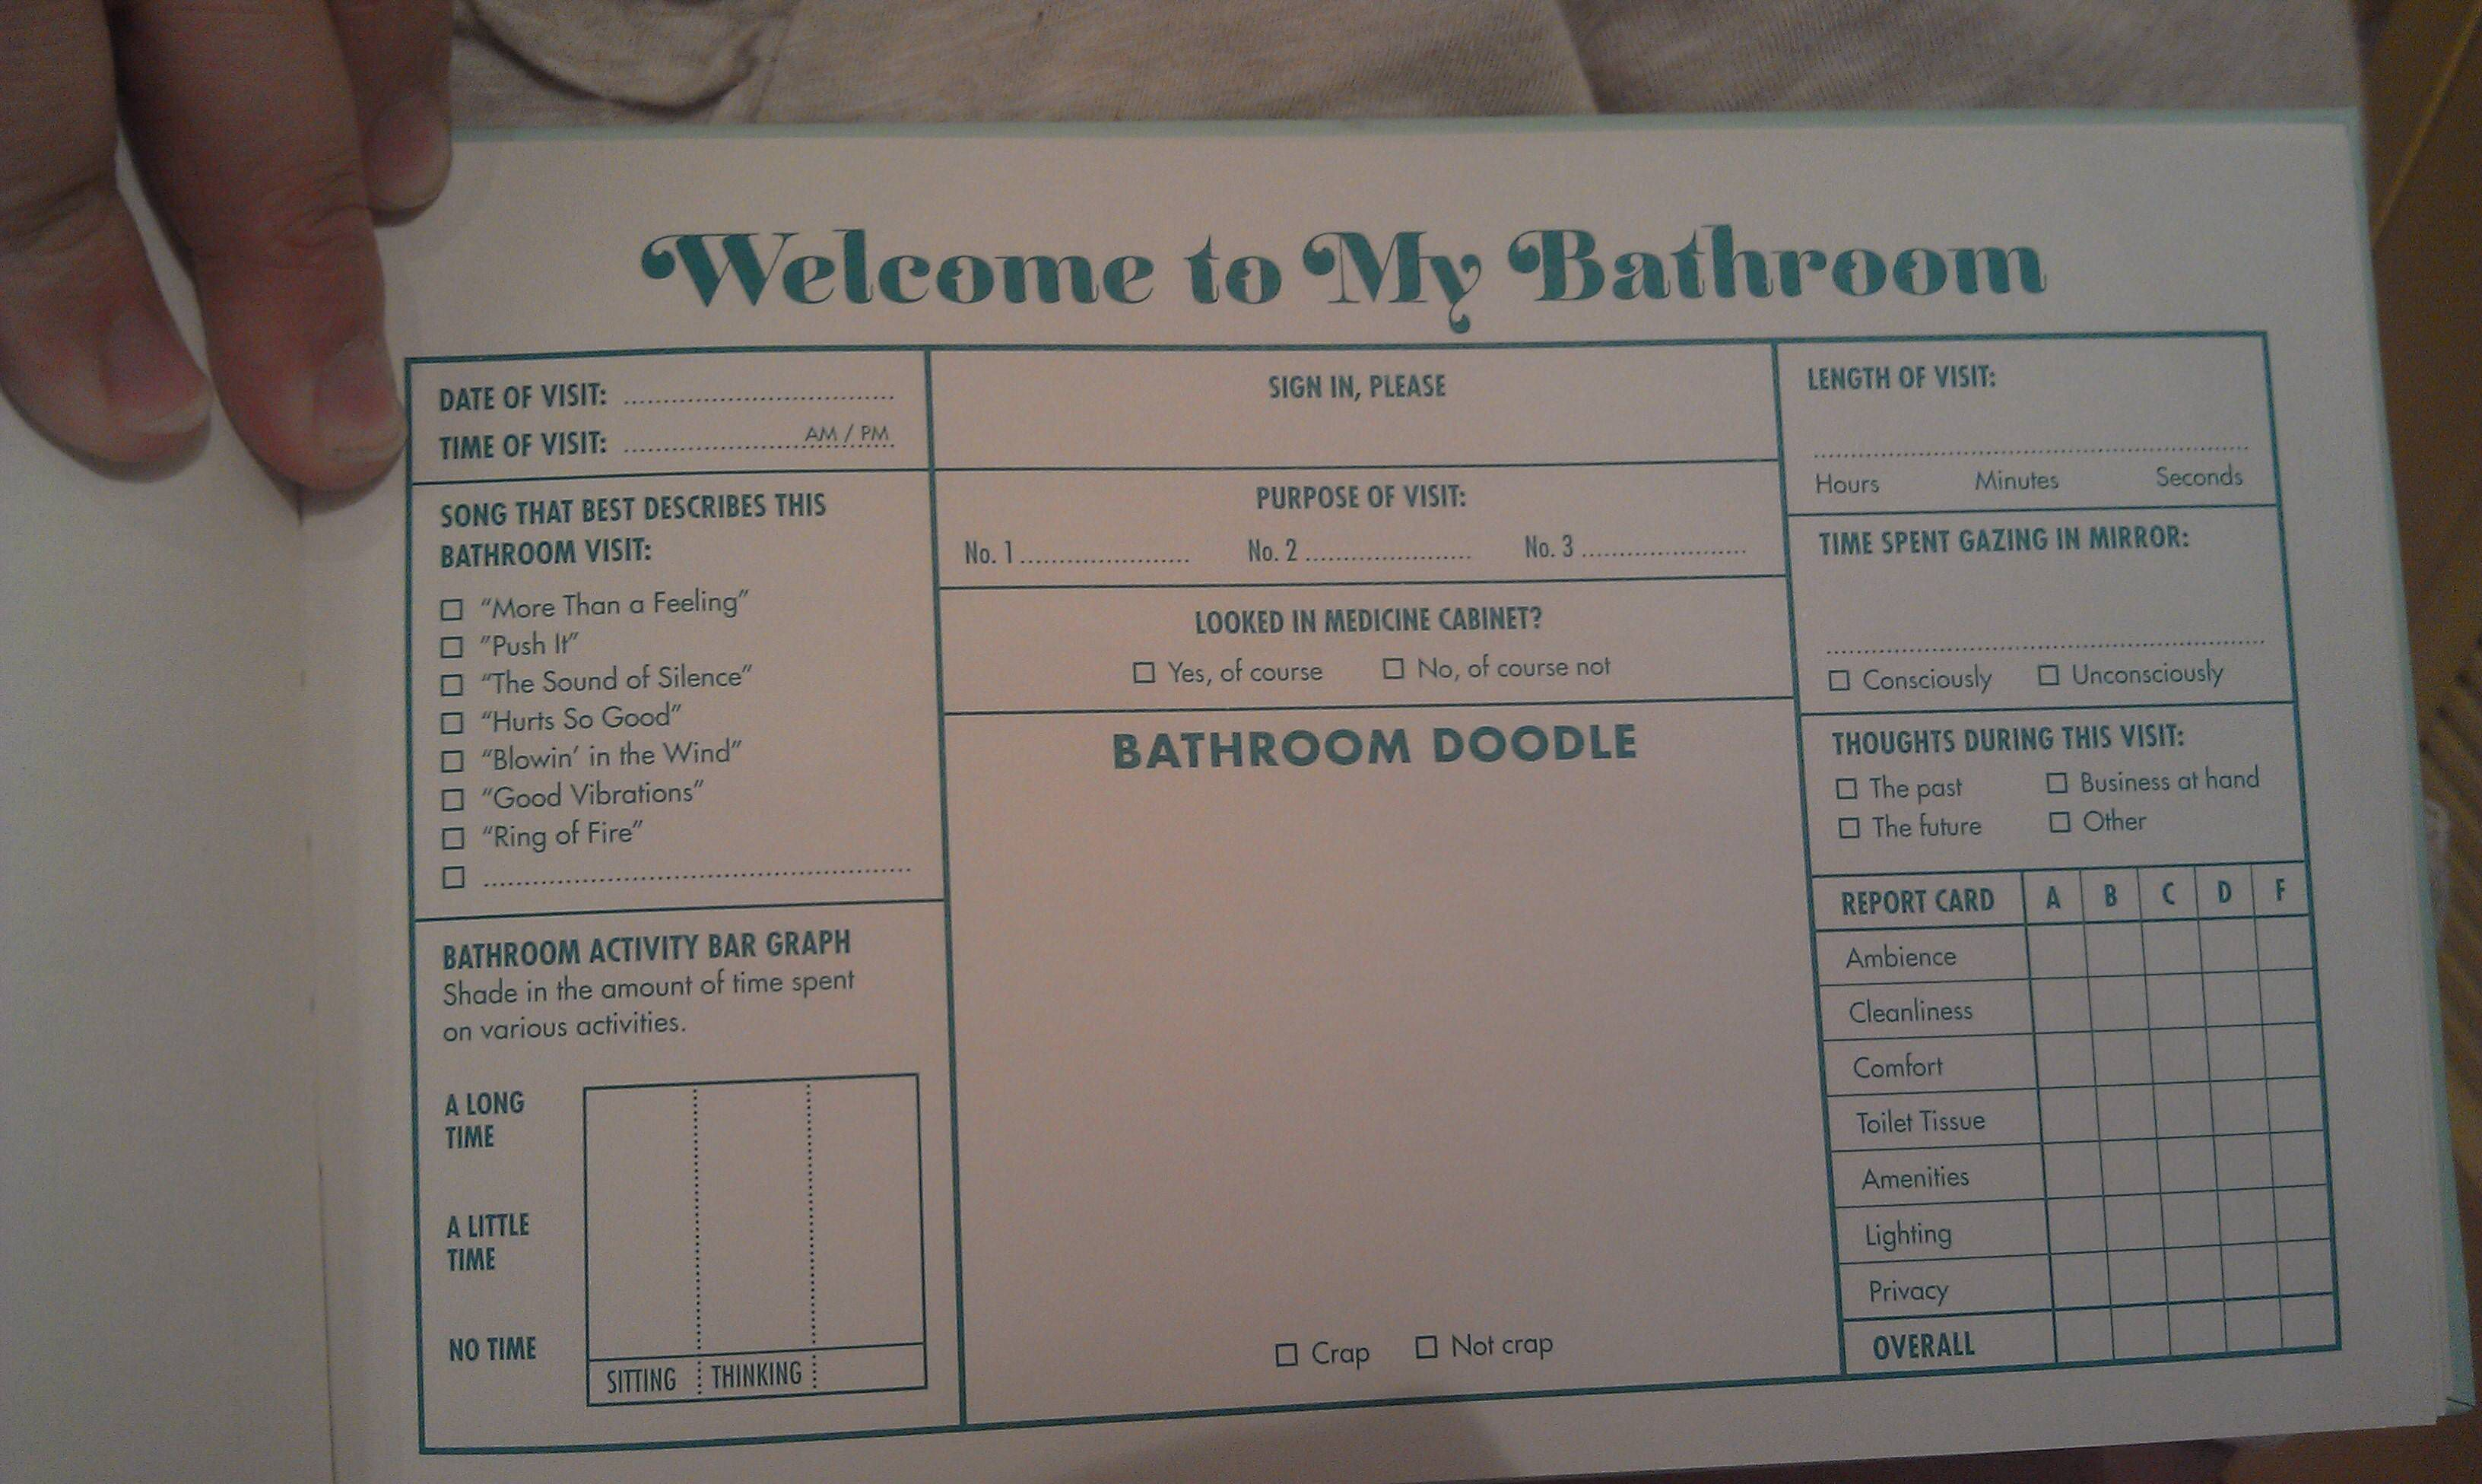 Essential for every bathroom